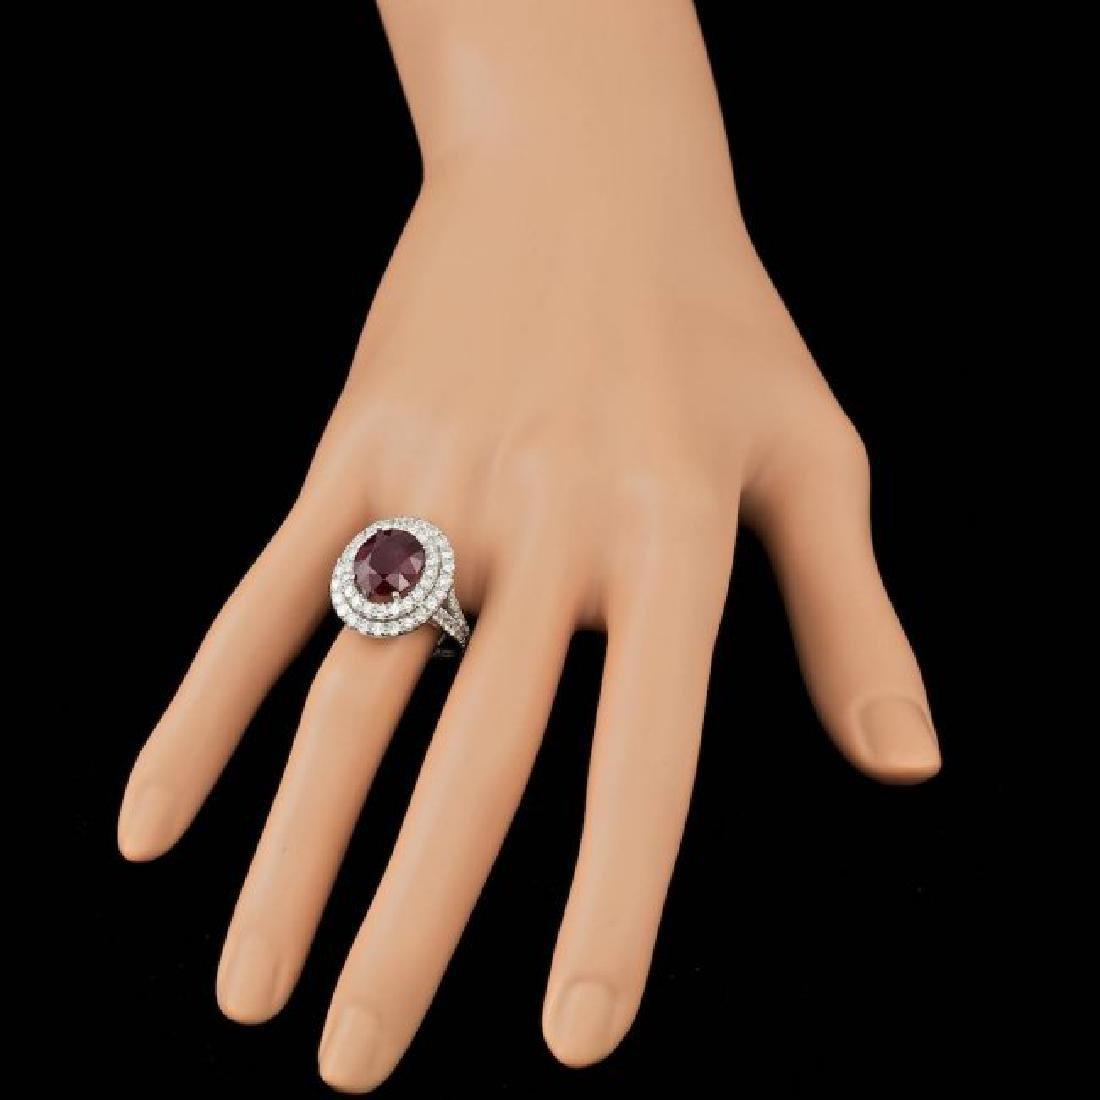 14k White Gold 5.50ct Ruby 2.15ct Diamond Ring - 3